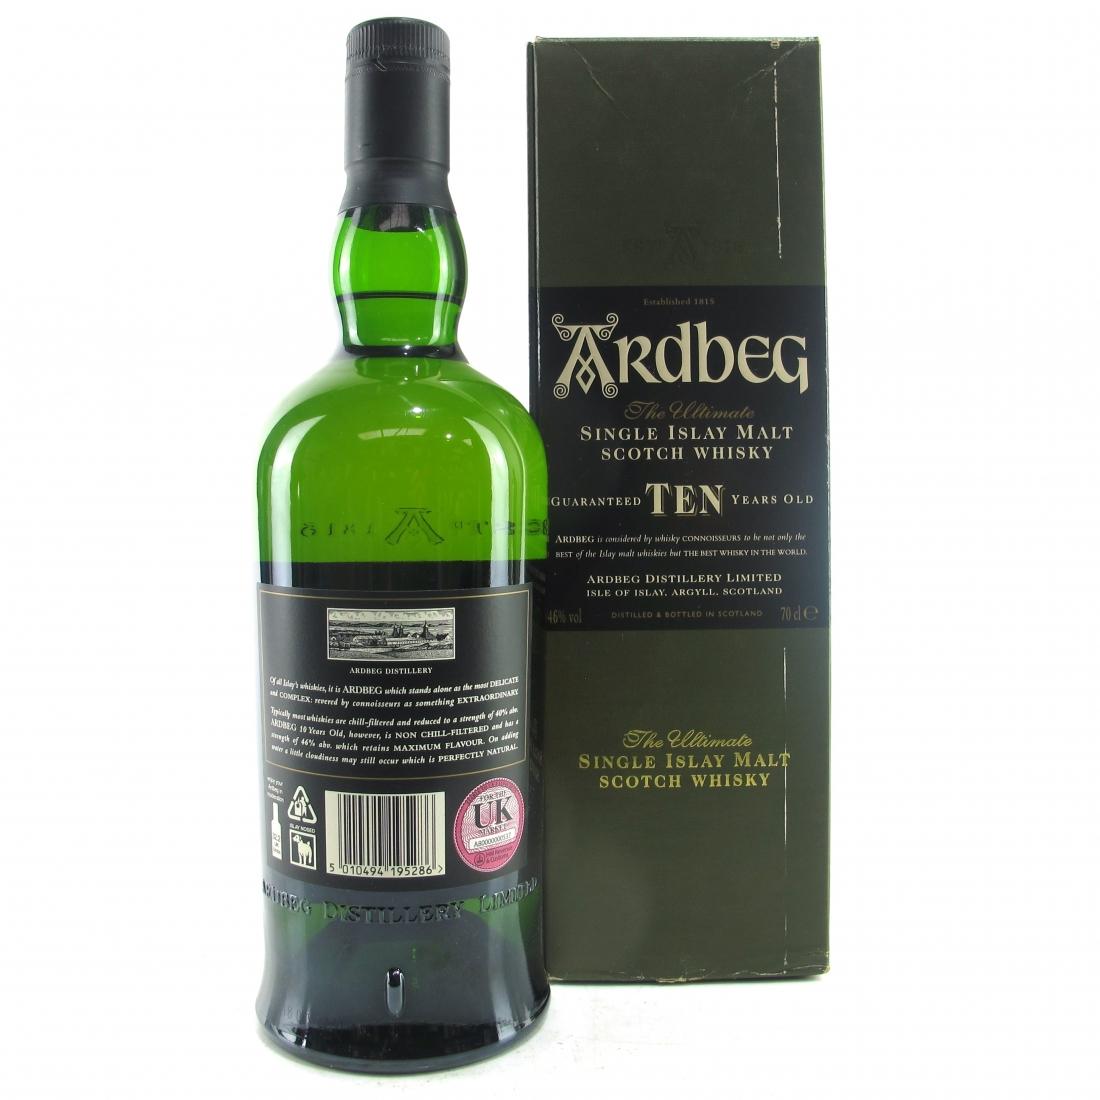 Ardbeg 10 Year Old / World Whisky of the Year 2008